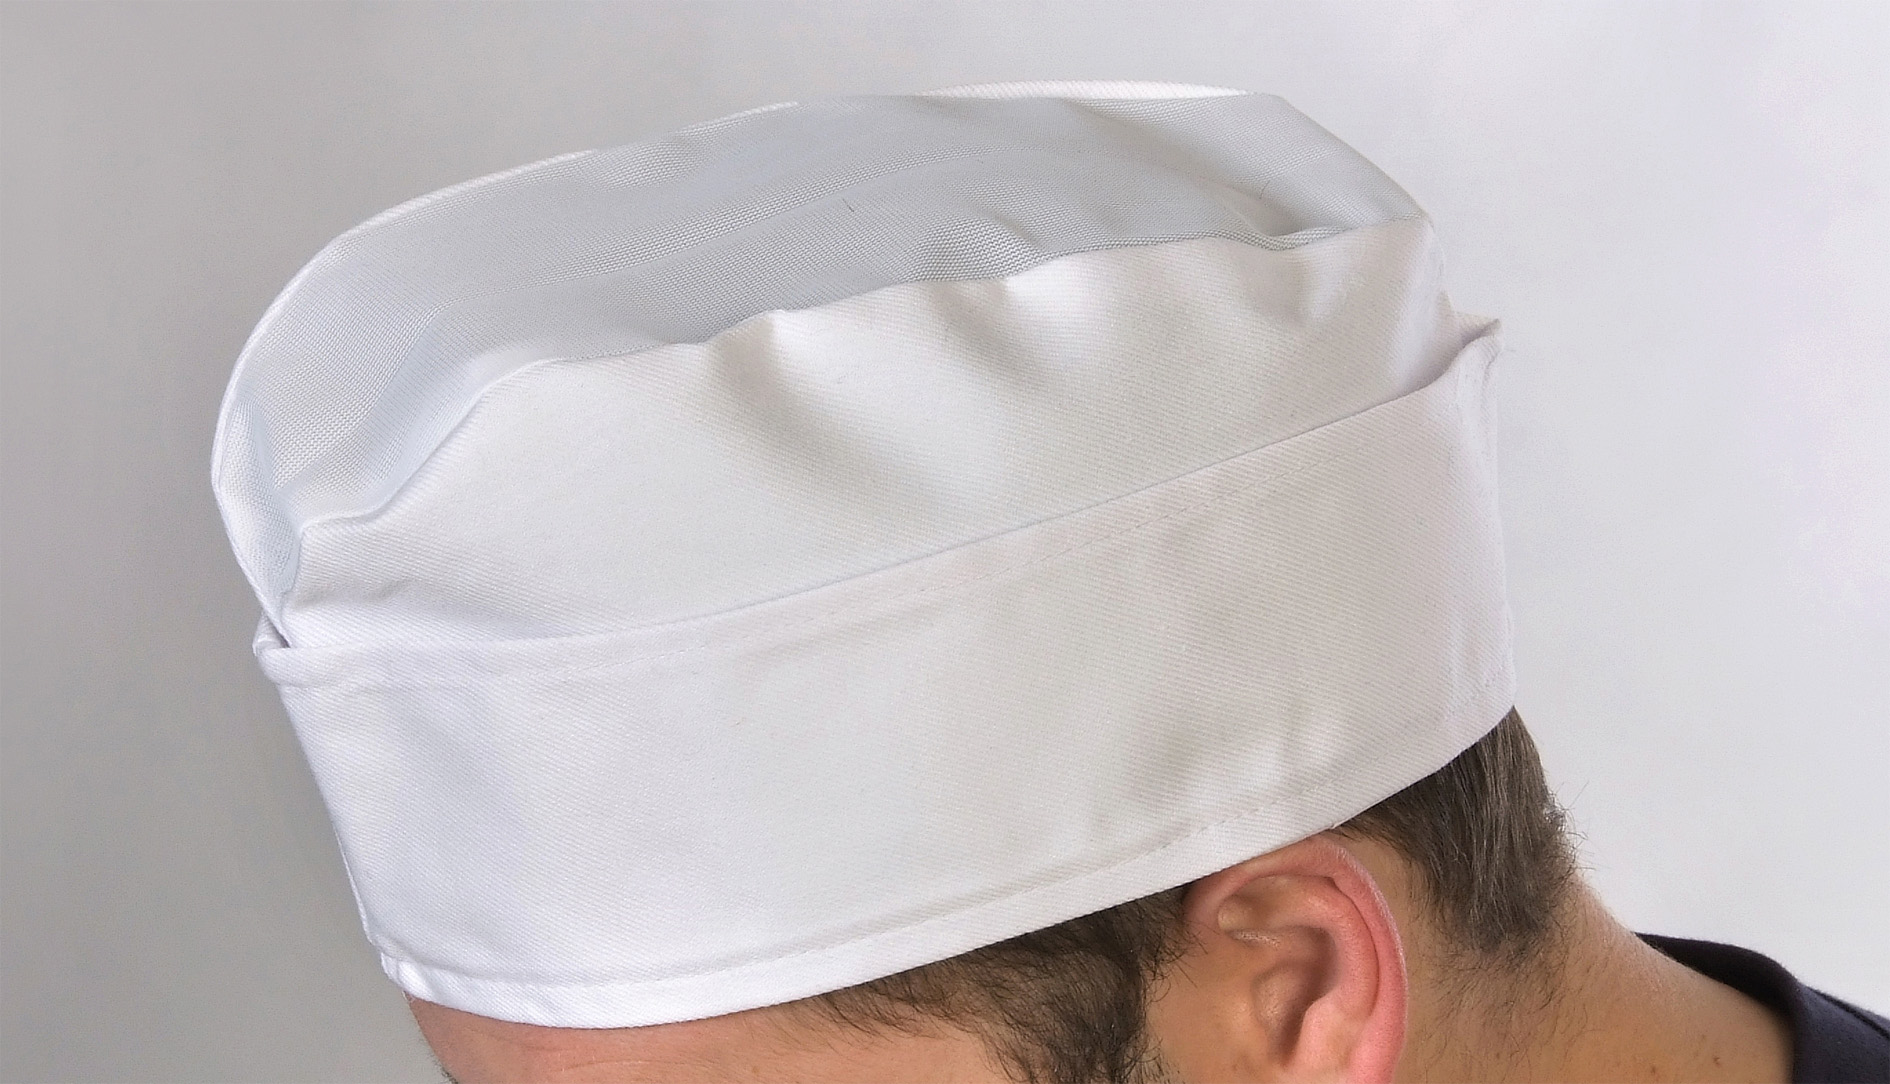 Gorro barco blanco Image